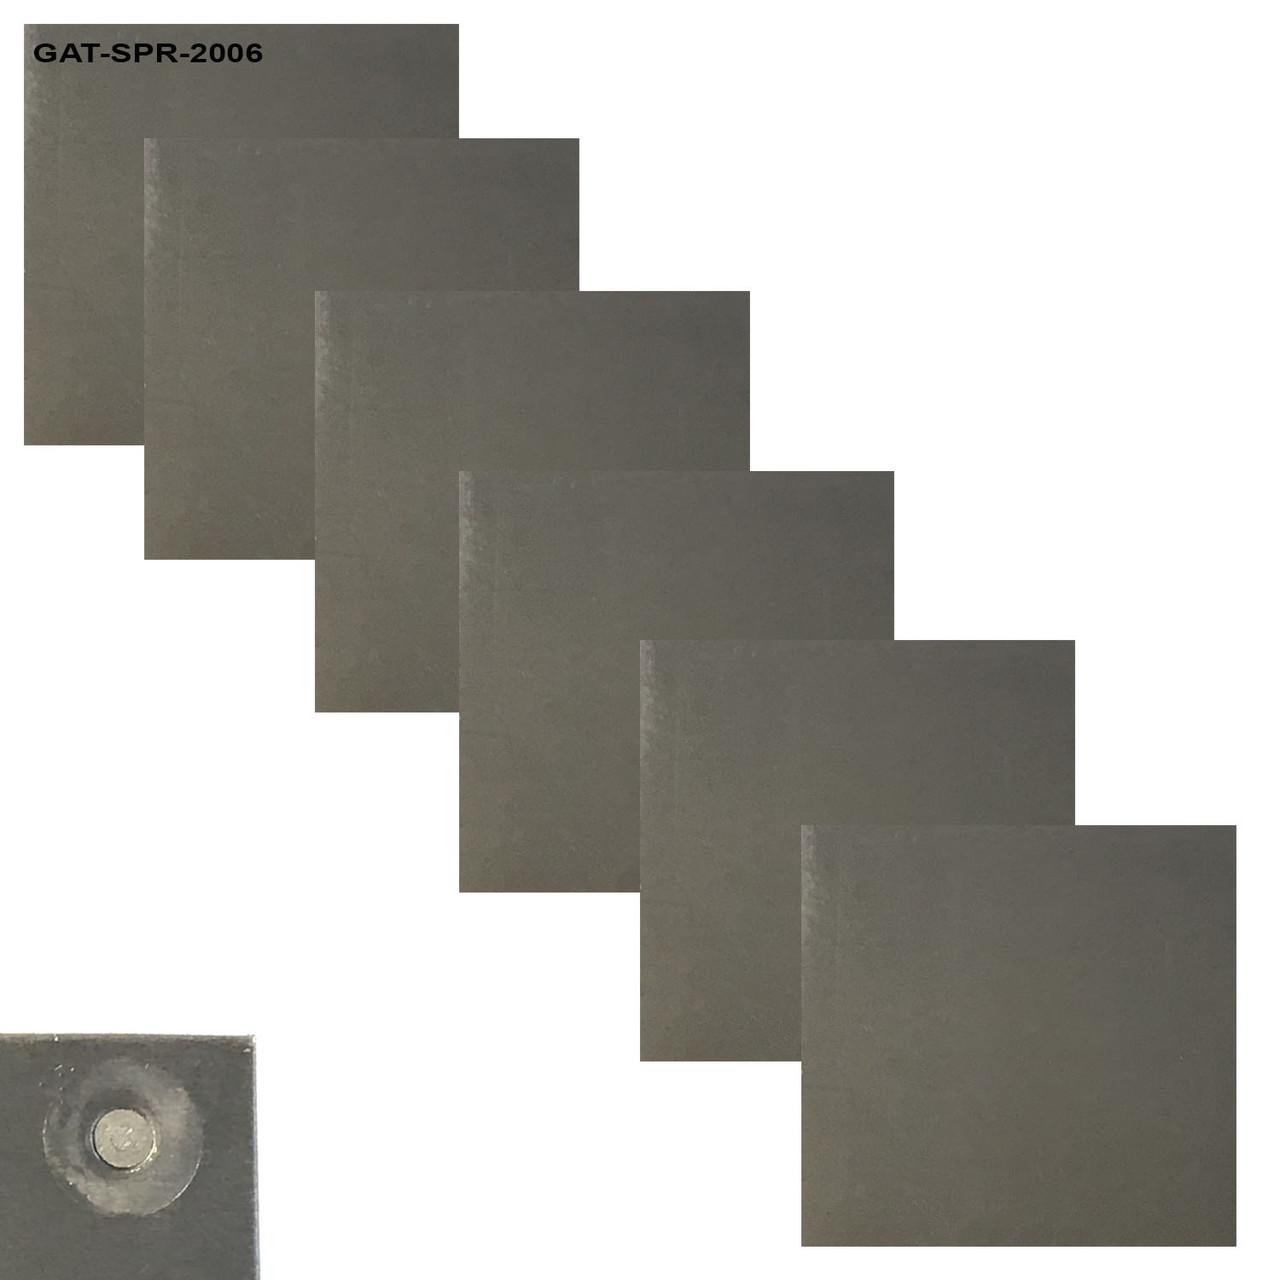 Aluminum Self Piercing Rivet Training & Test Panels - 6 Pack